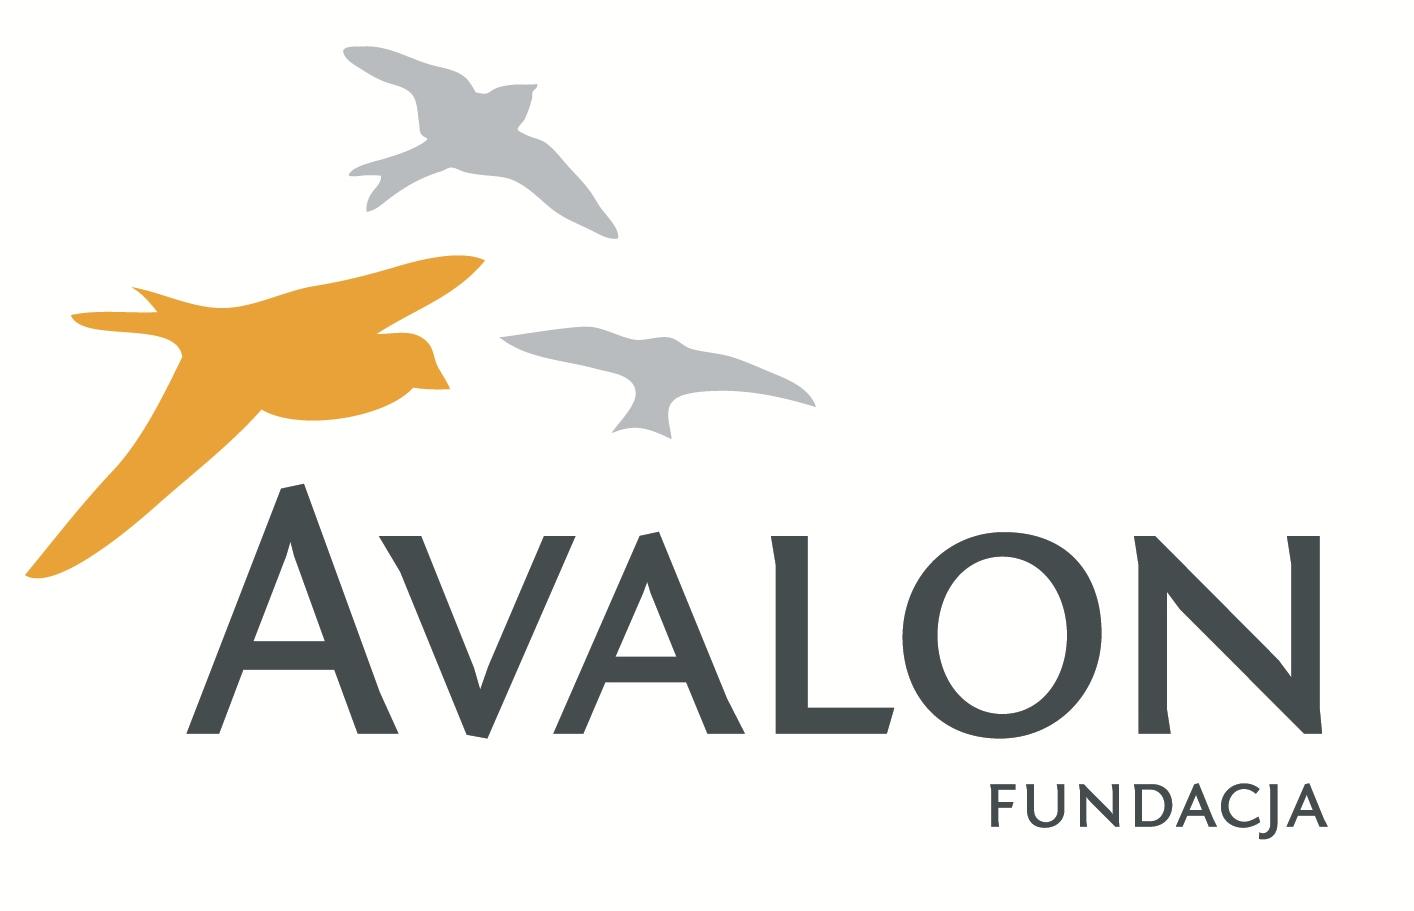 Logo Avalon 4